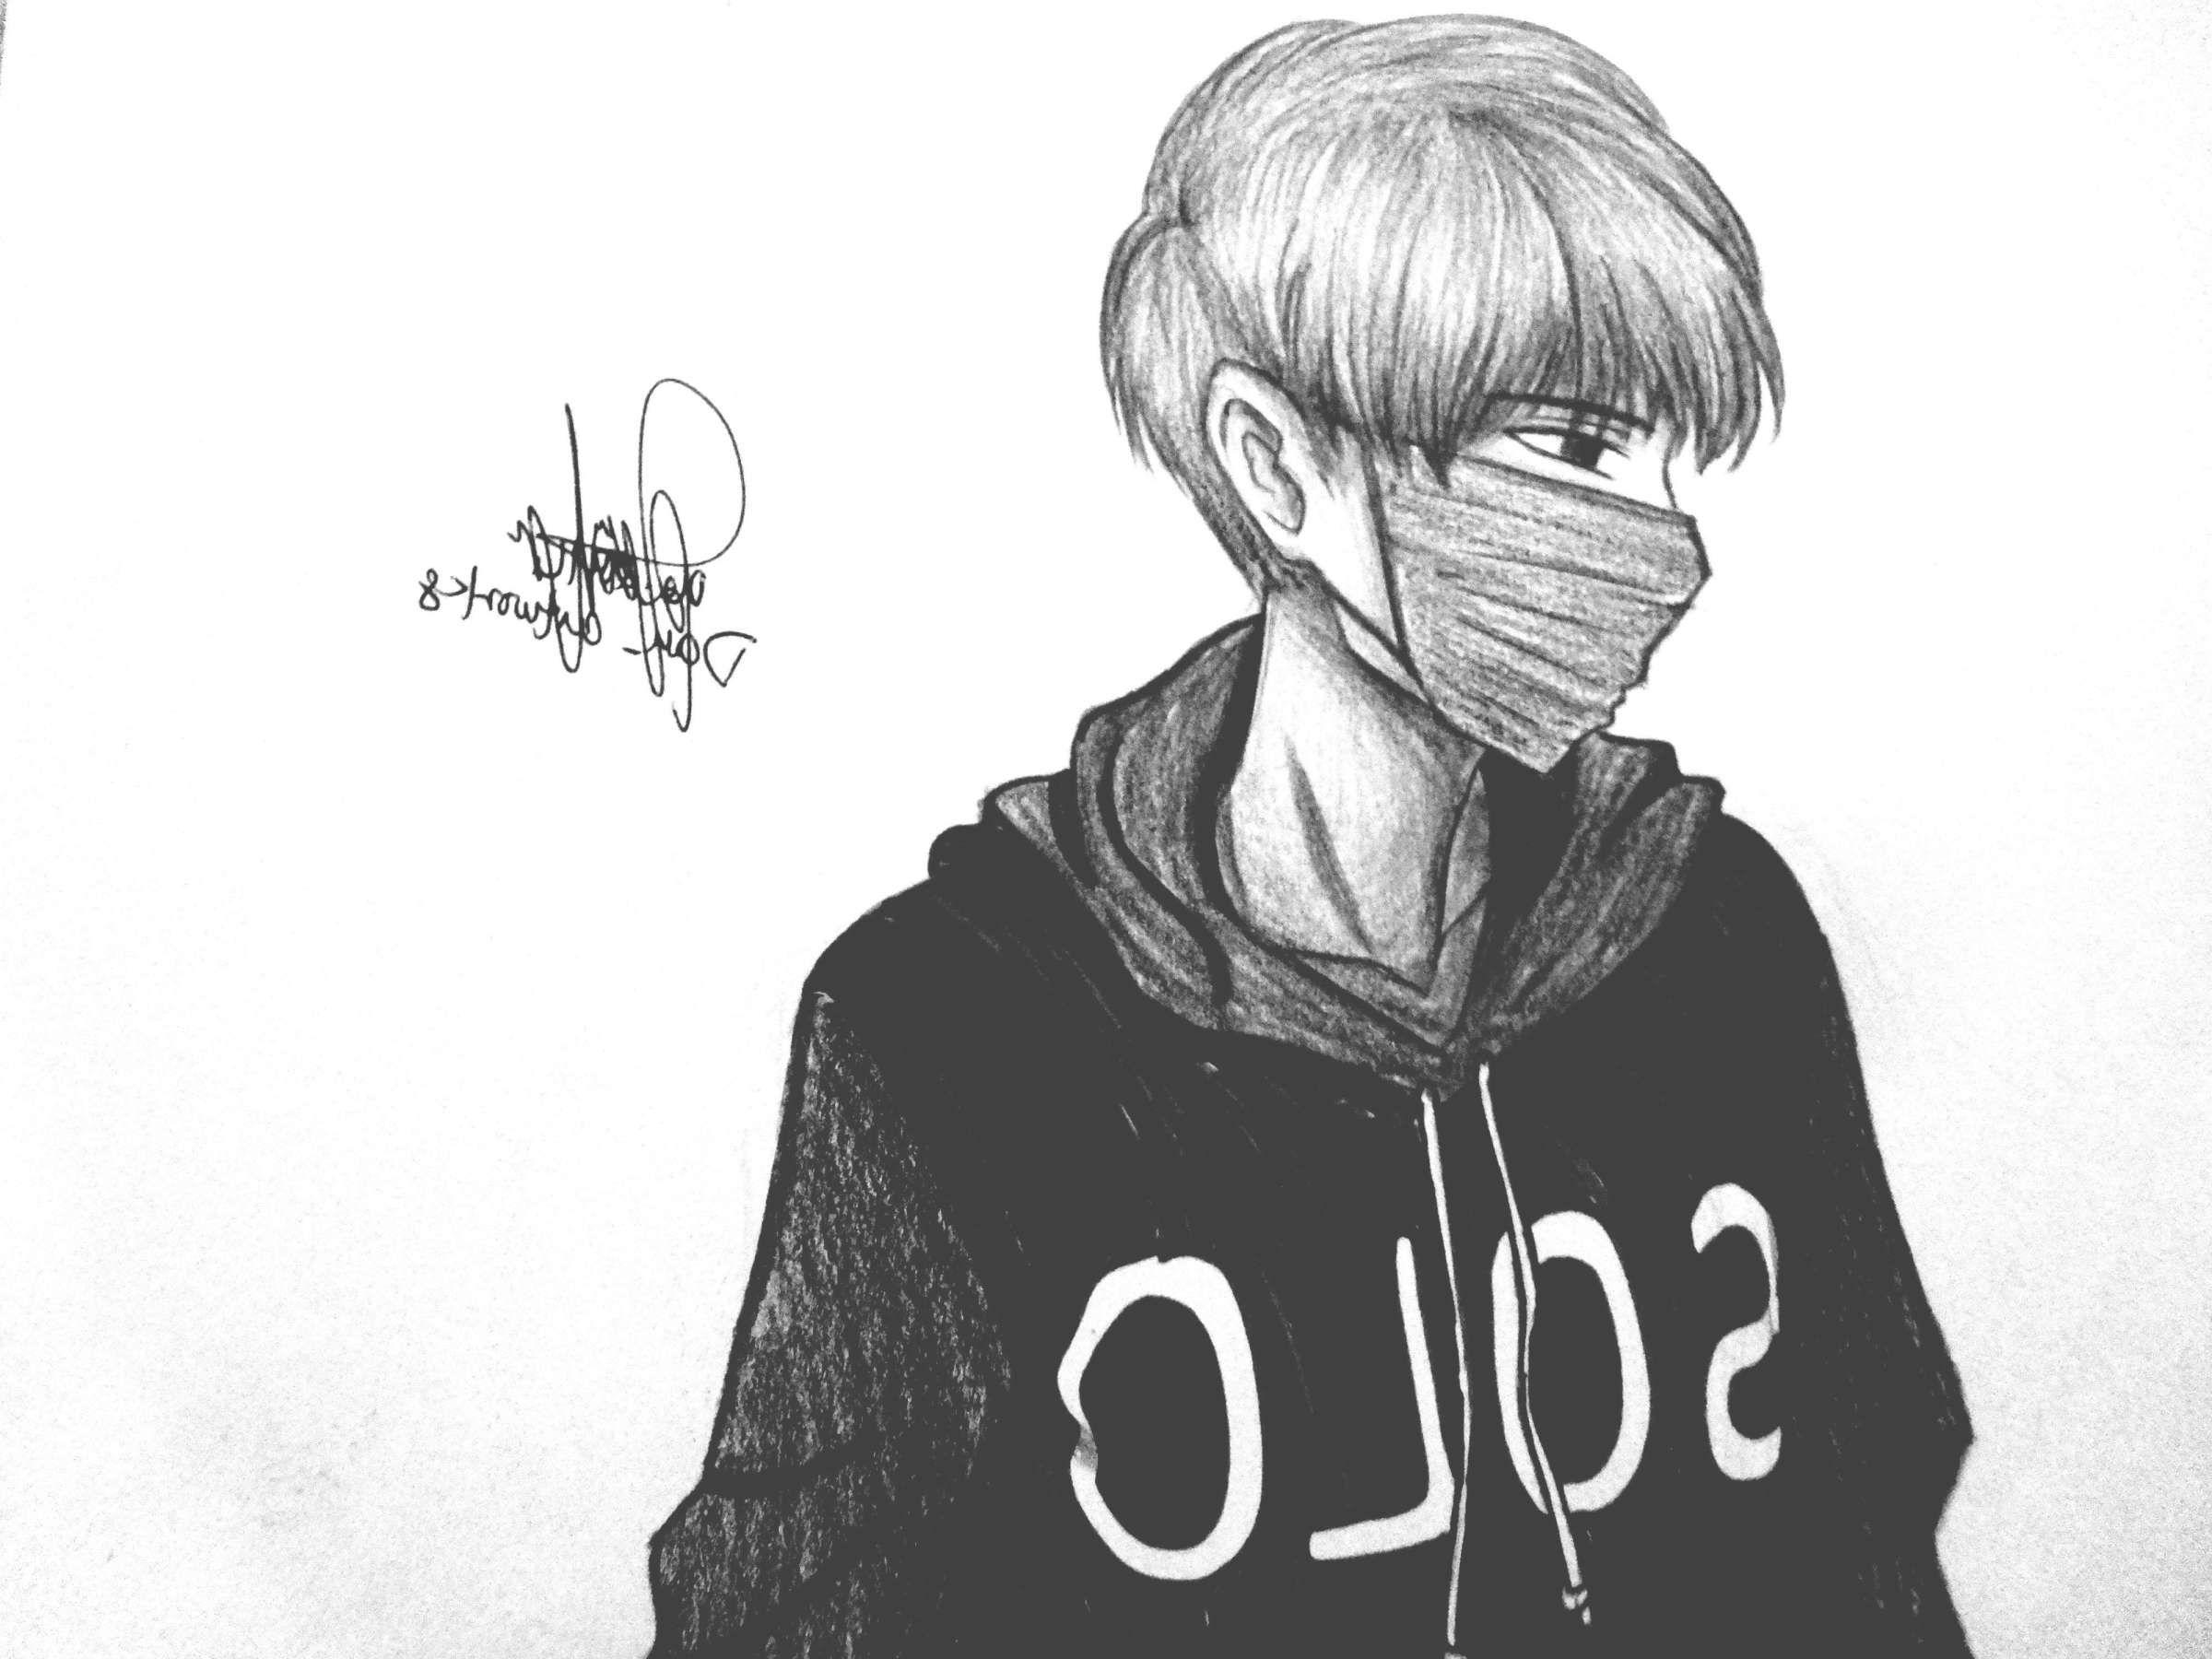 17 Anime Black And White Drawings Anime Drawings Boy Boy Drawing Anime Boy Sketch